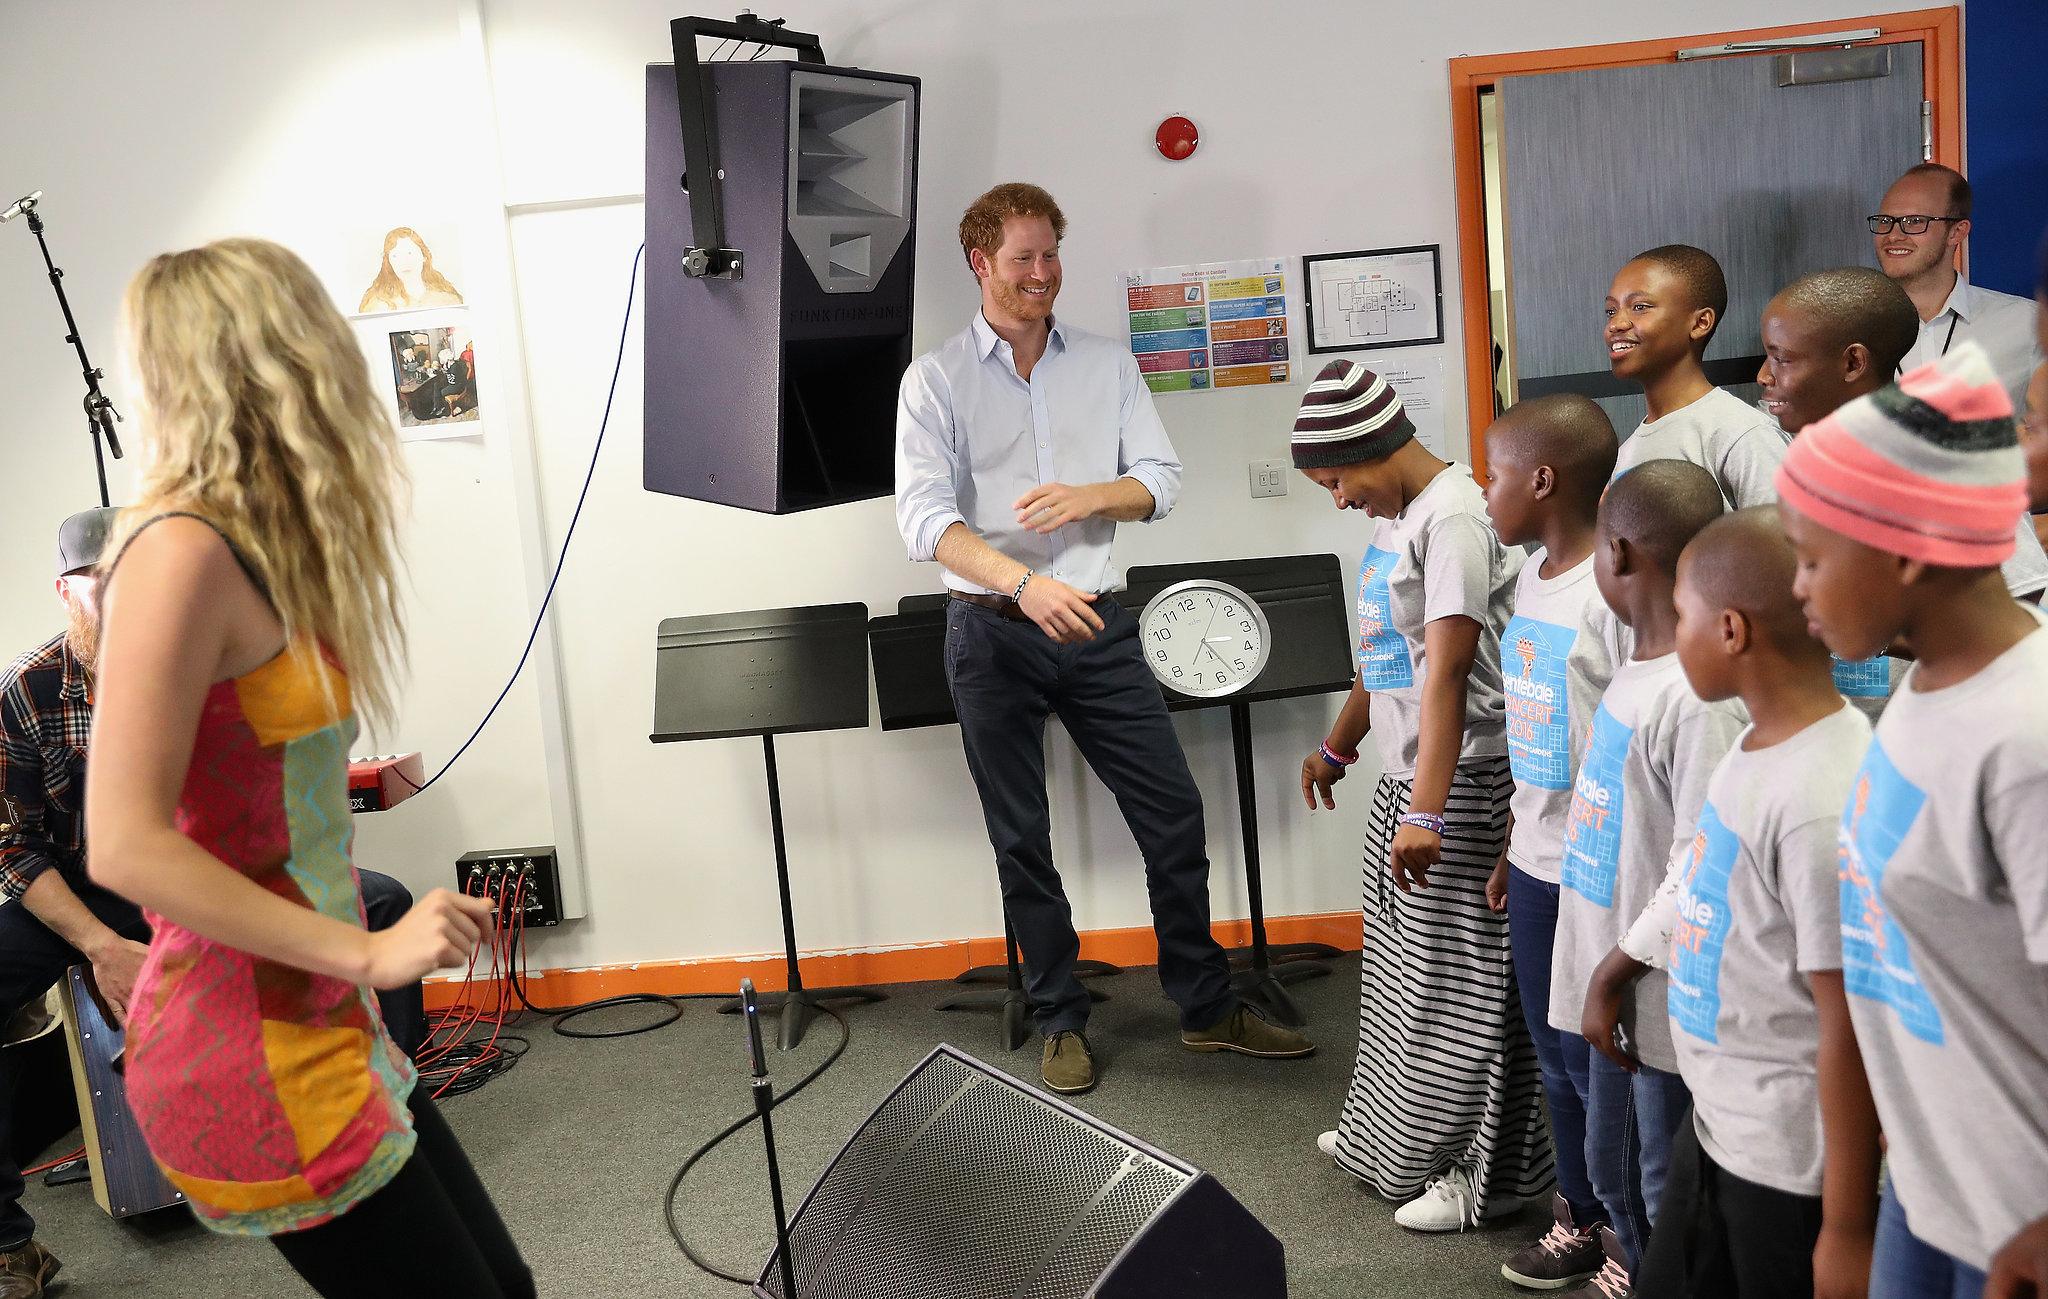 Prince-Harry-Joss-Stone-Children-Choir-June-2016.jpg